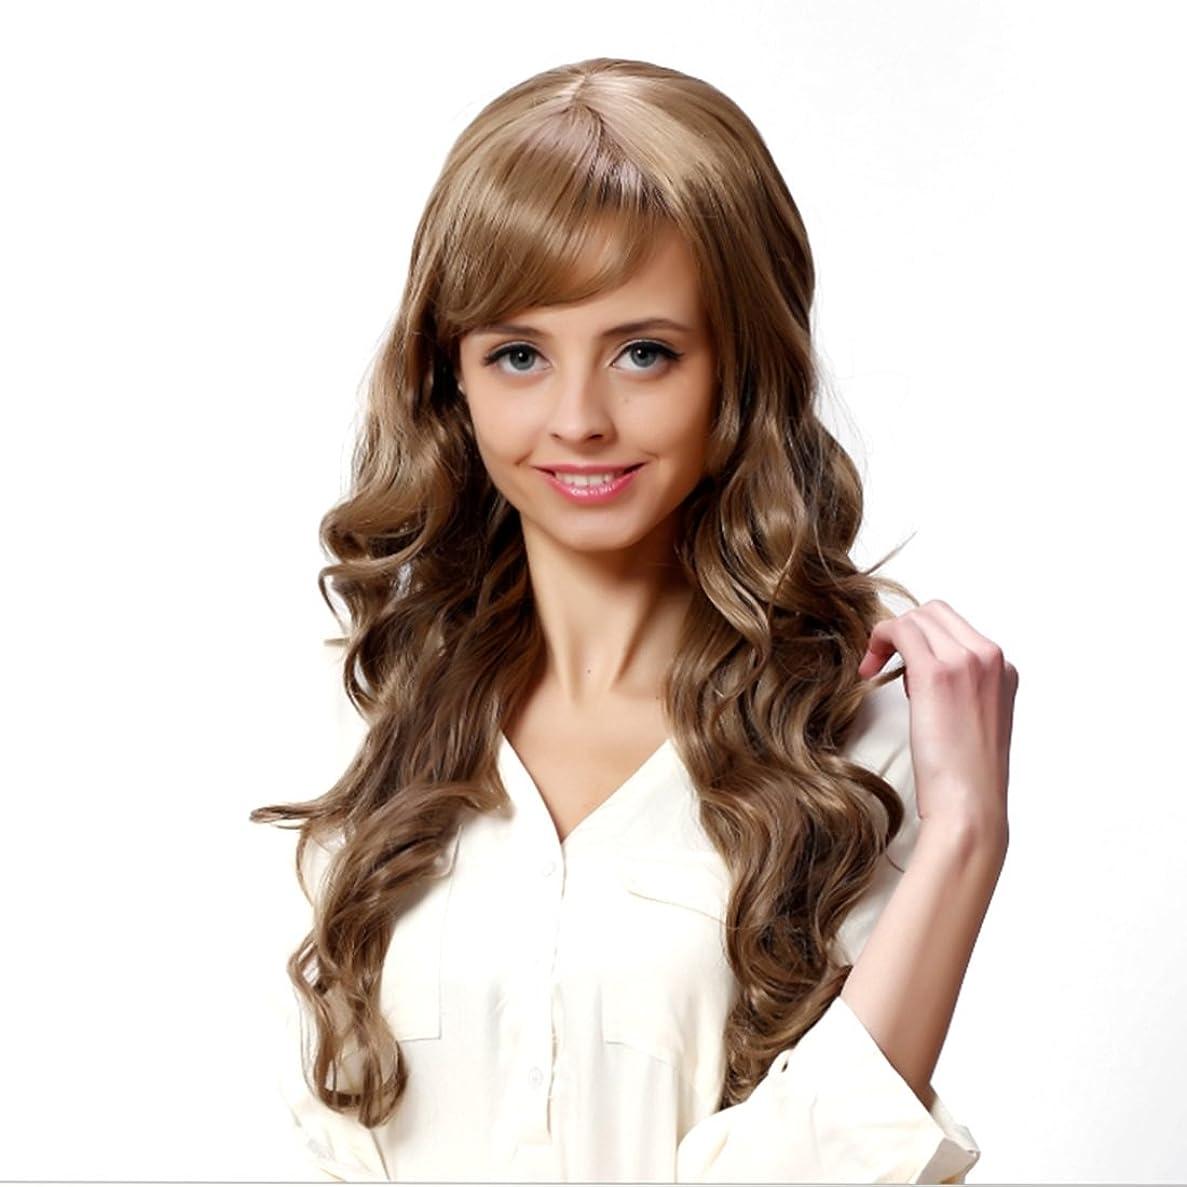 JIANFU 女性のための現実的な大きな波状の長い縮毛のかつらフルサイズの頭のカーリーヘアフラフリな梨のフラワーウィッグ修正された顔の長さ21inch / 22inch(ブラウンブラック/ベージュ)のための斜めバンズウィッグ (Color : ブラウン)